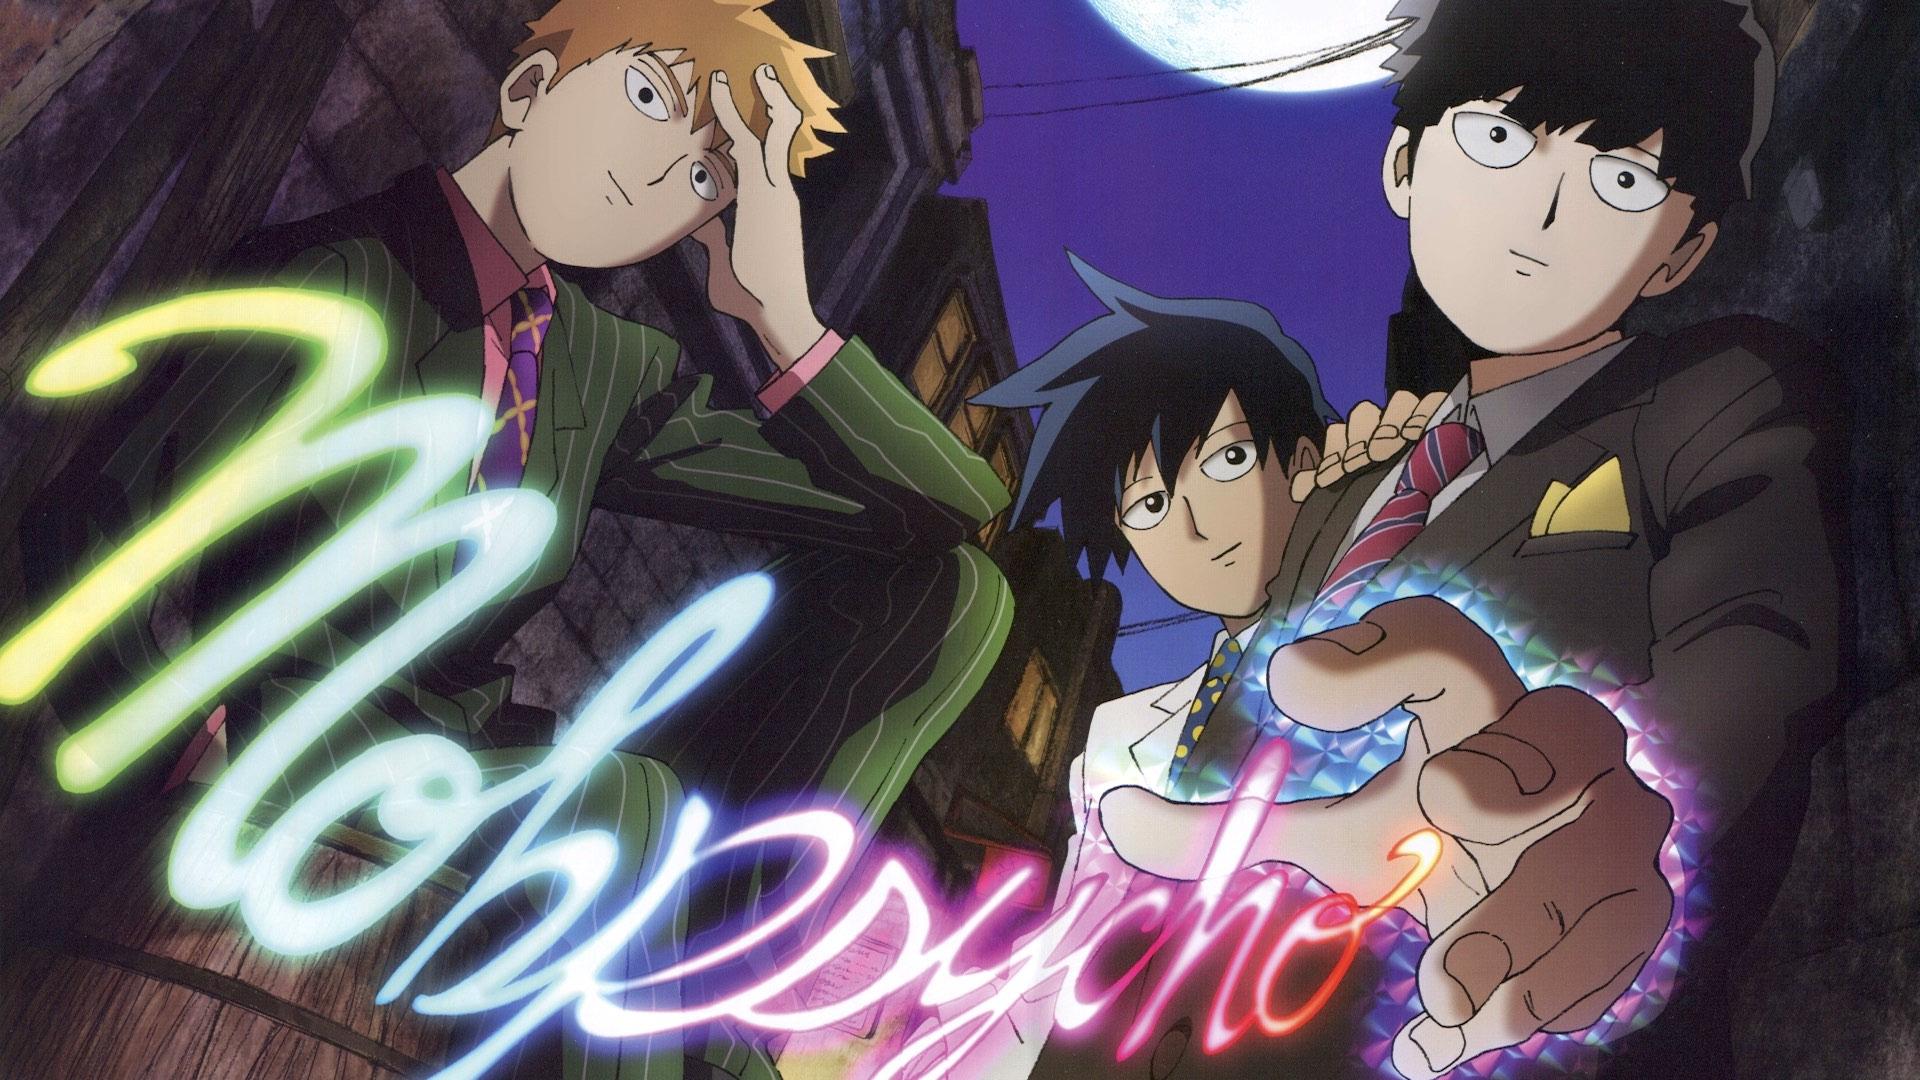 Anime Mob Psycho 100